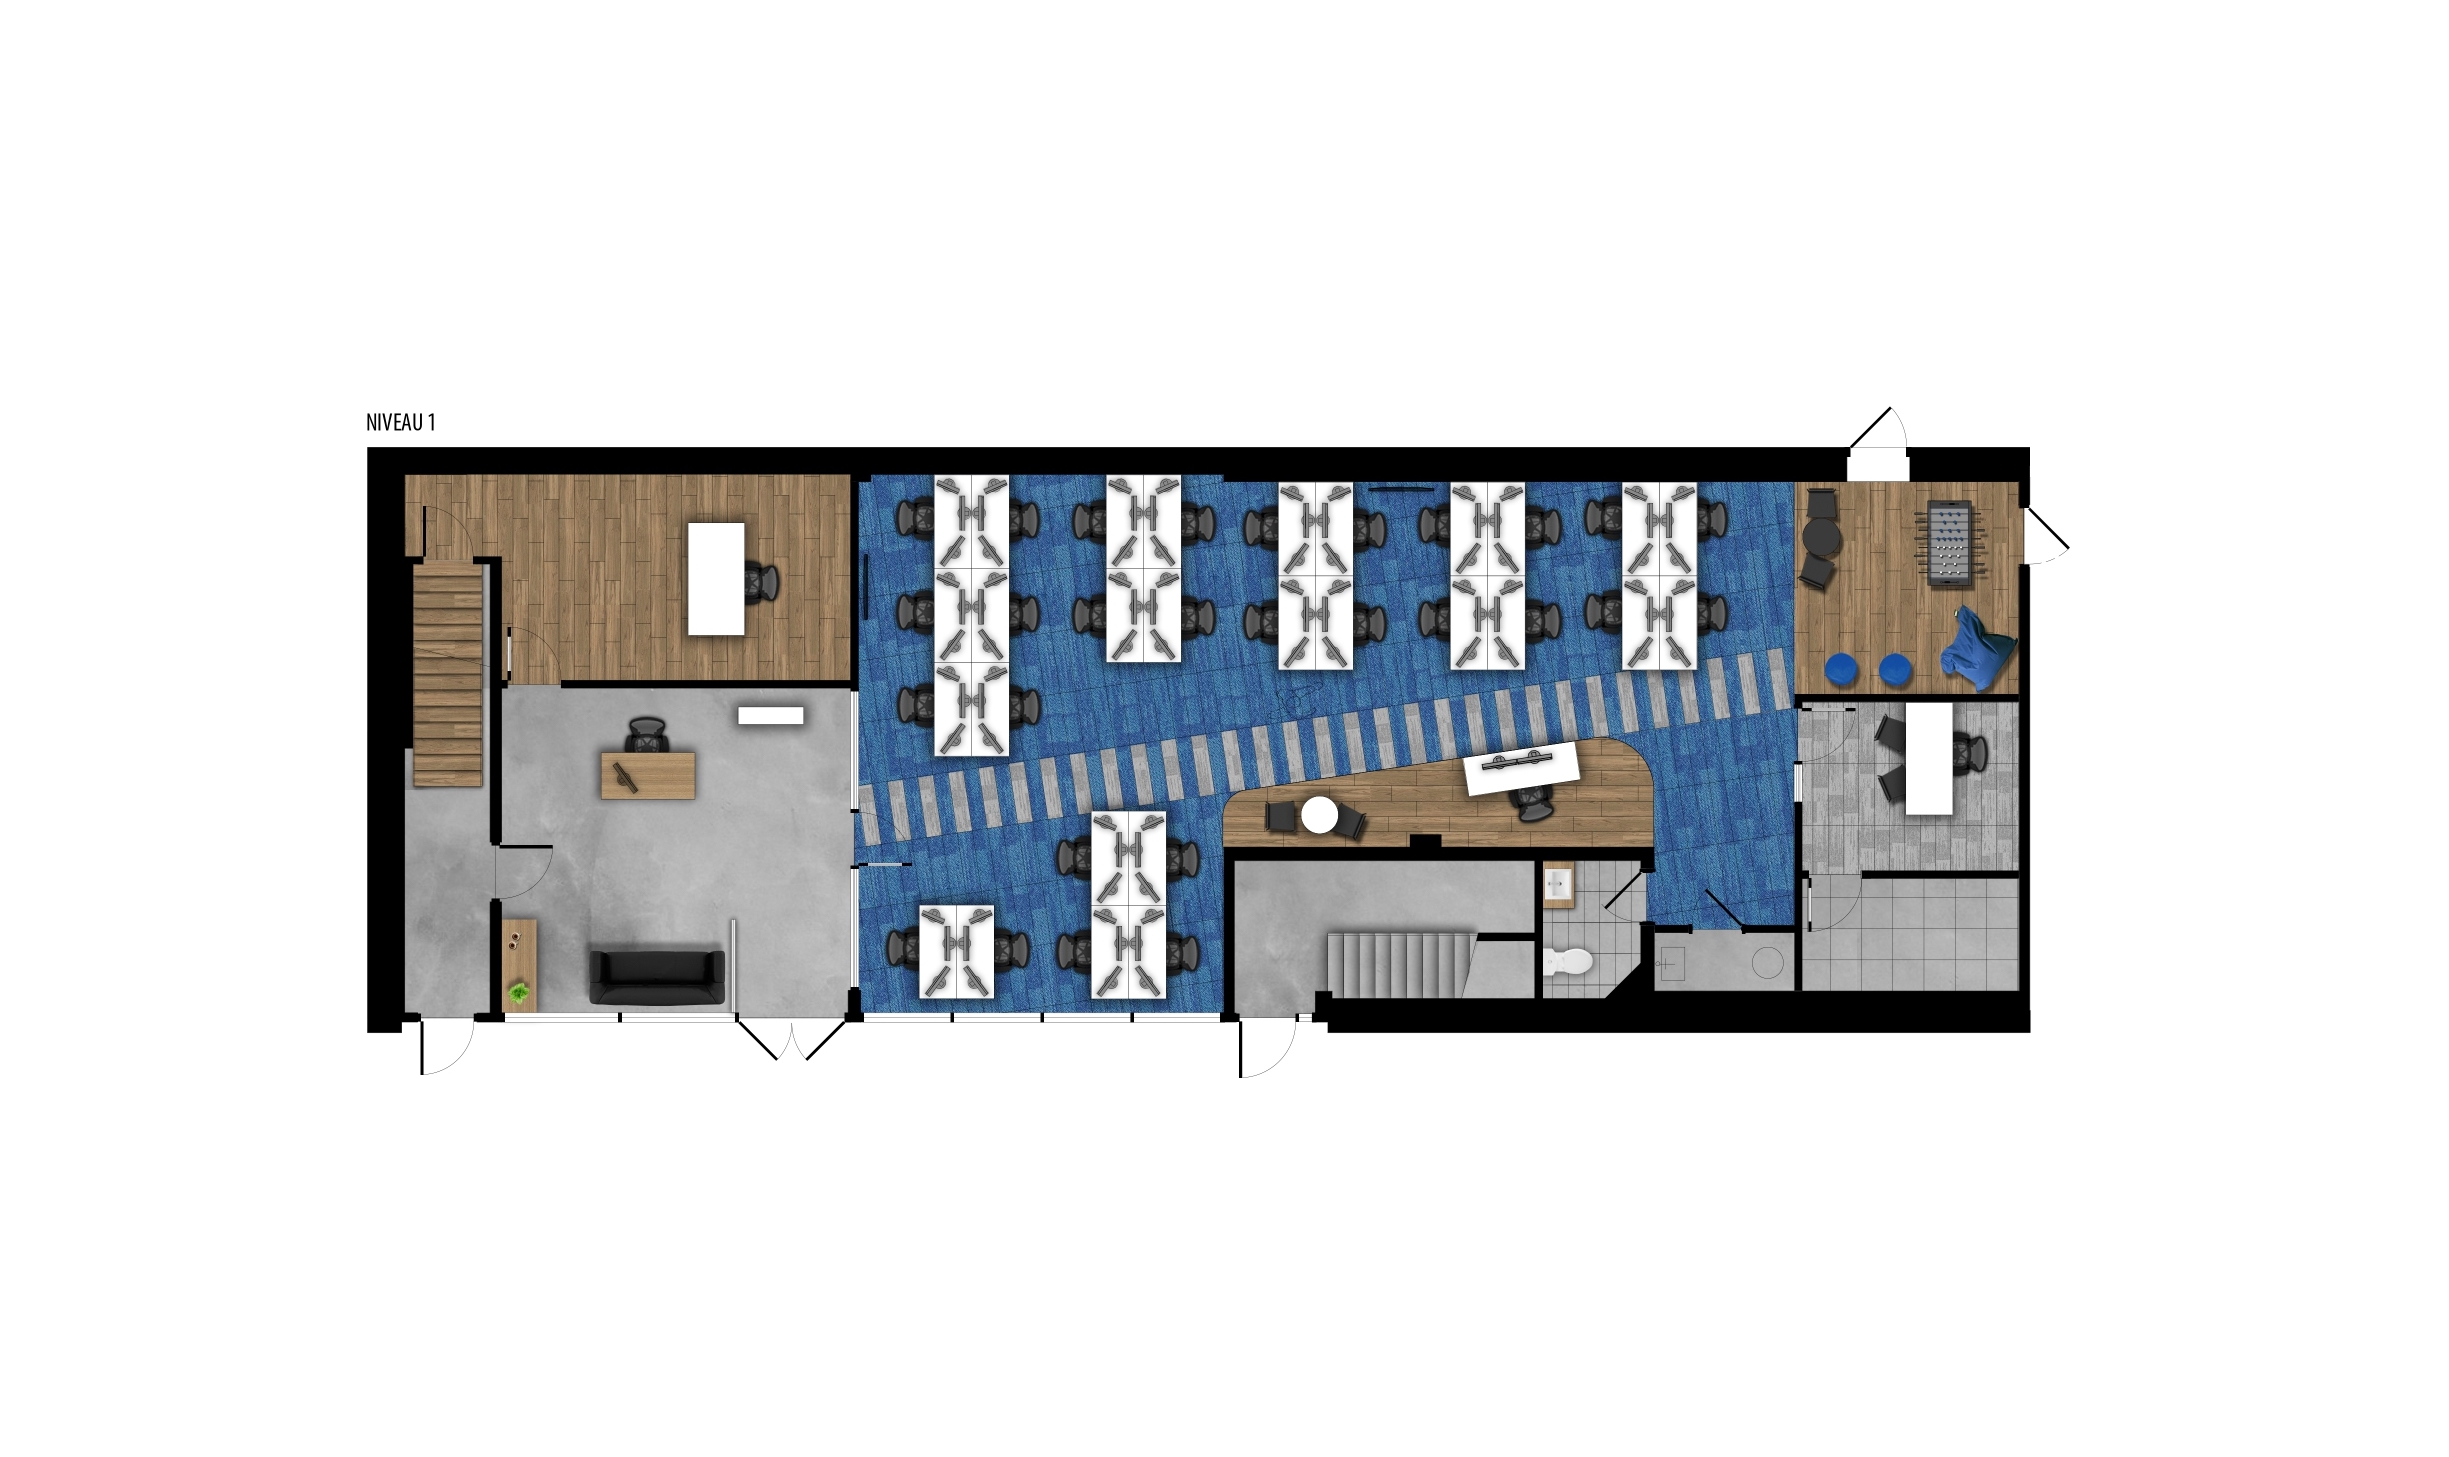 Plan d'aménagement - niveau 1